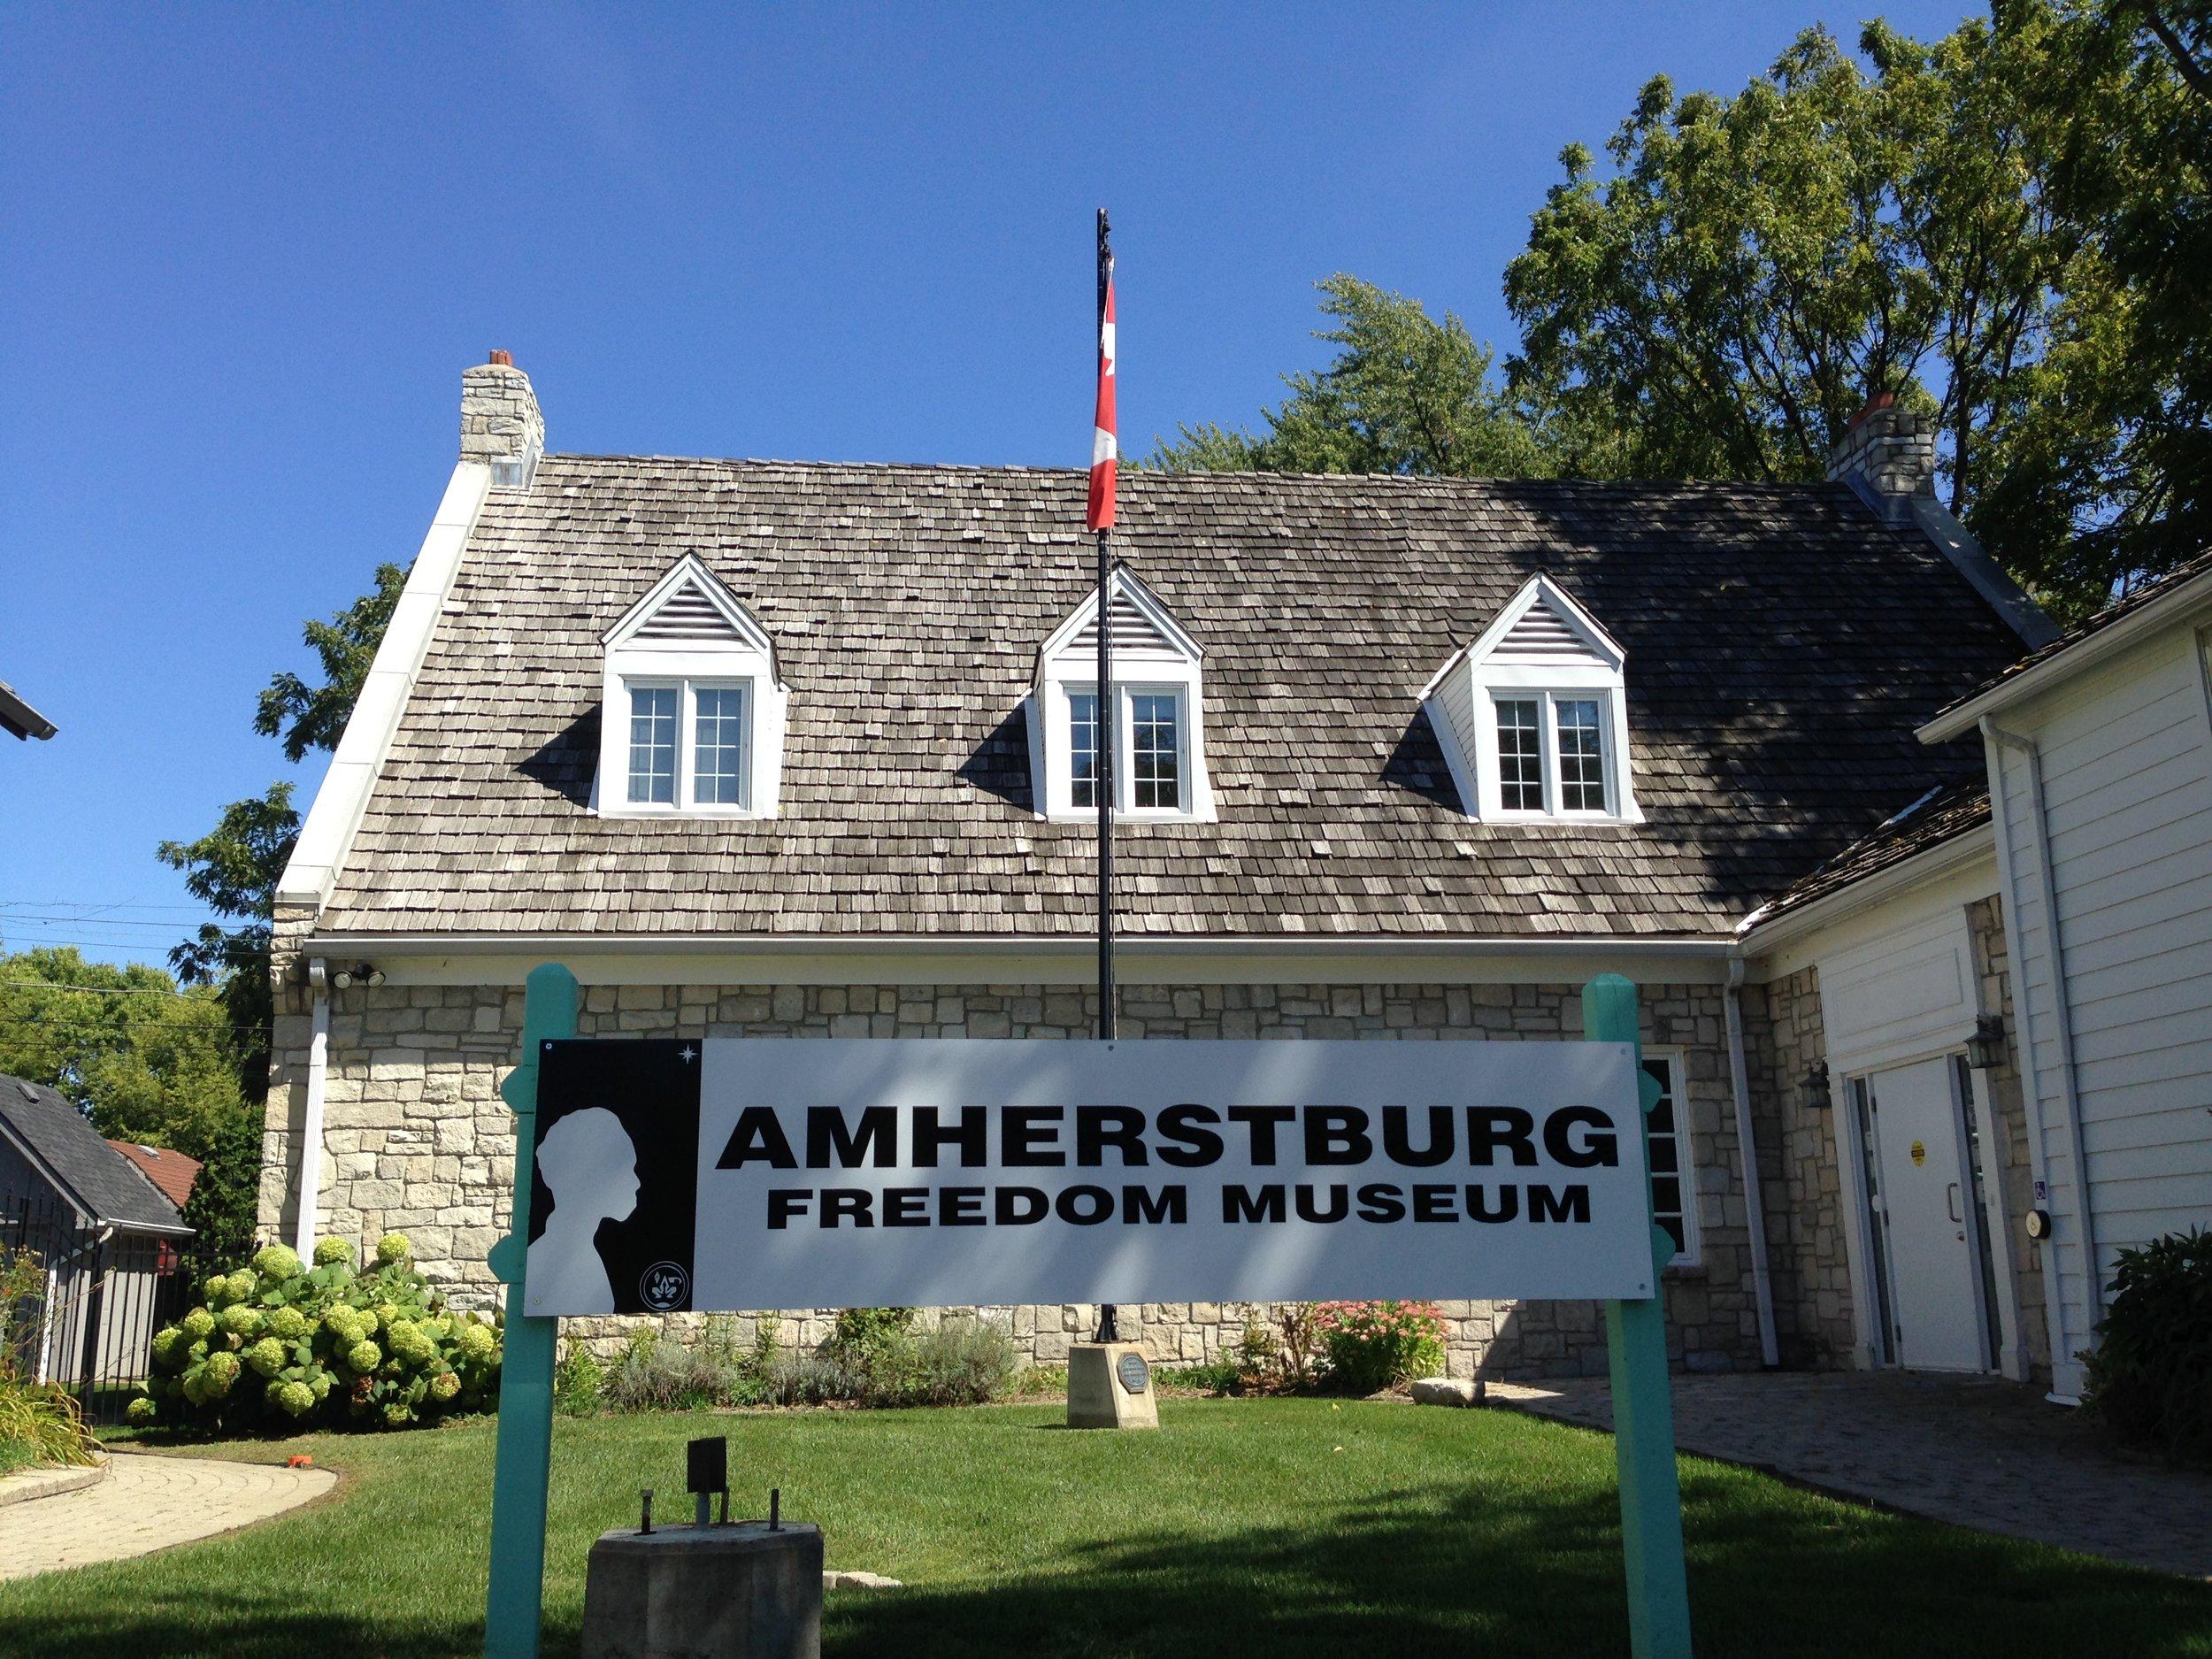 freedom museum 5.JPG